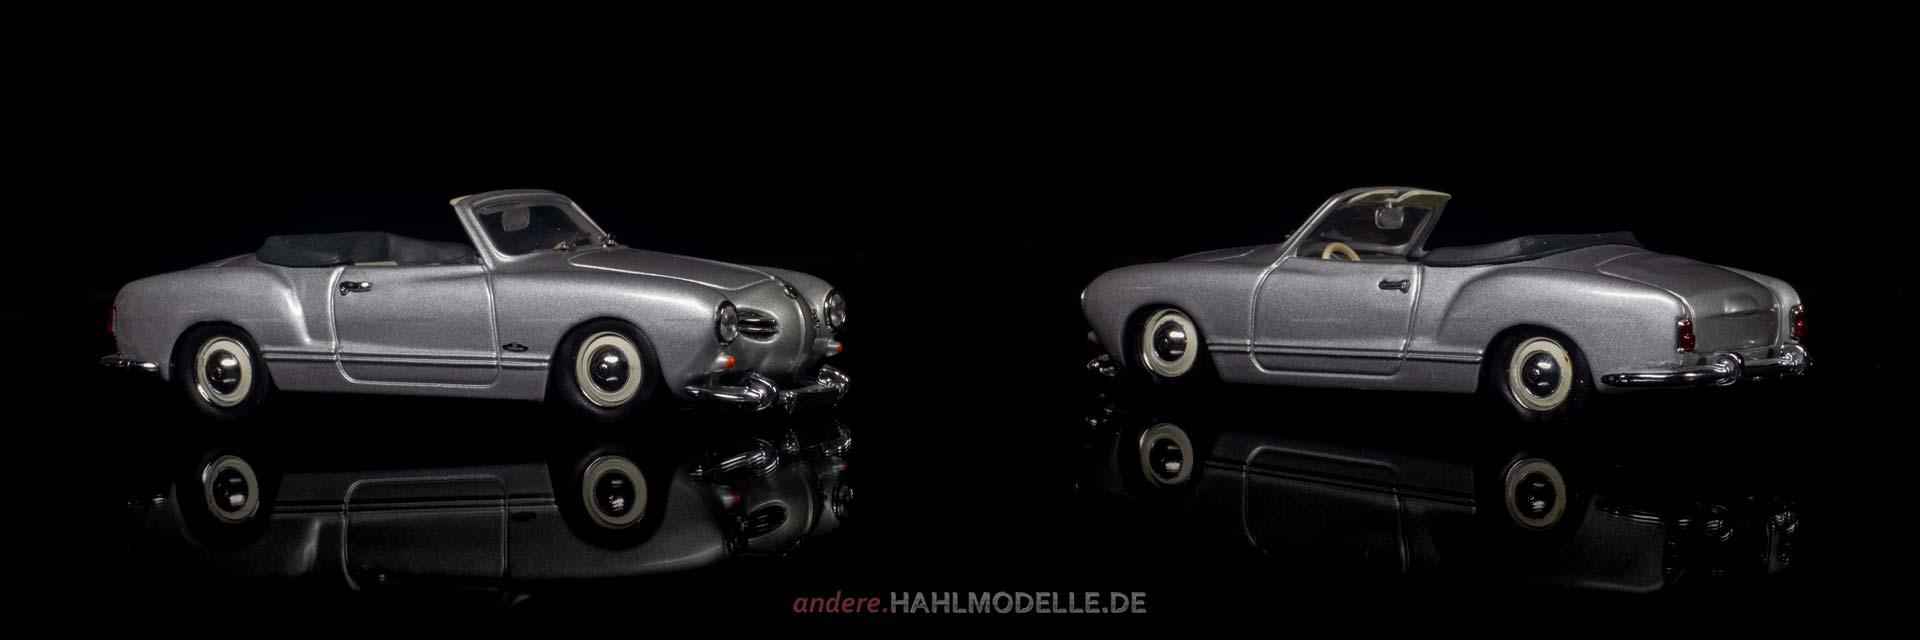 Volkswagen Karmann Ghia 1200 (Typ 14) | Cabriolet | Minichamps | 1:43 | www.andere.hahlmodelle.de